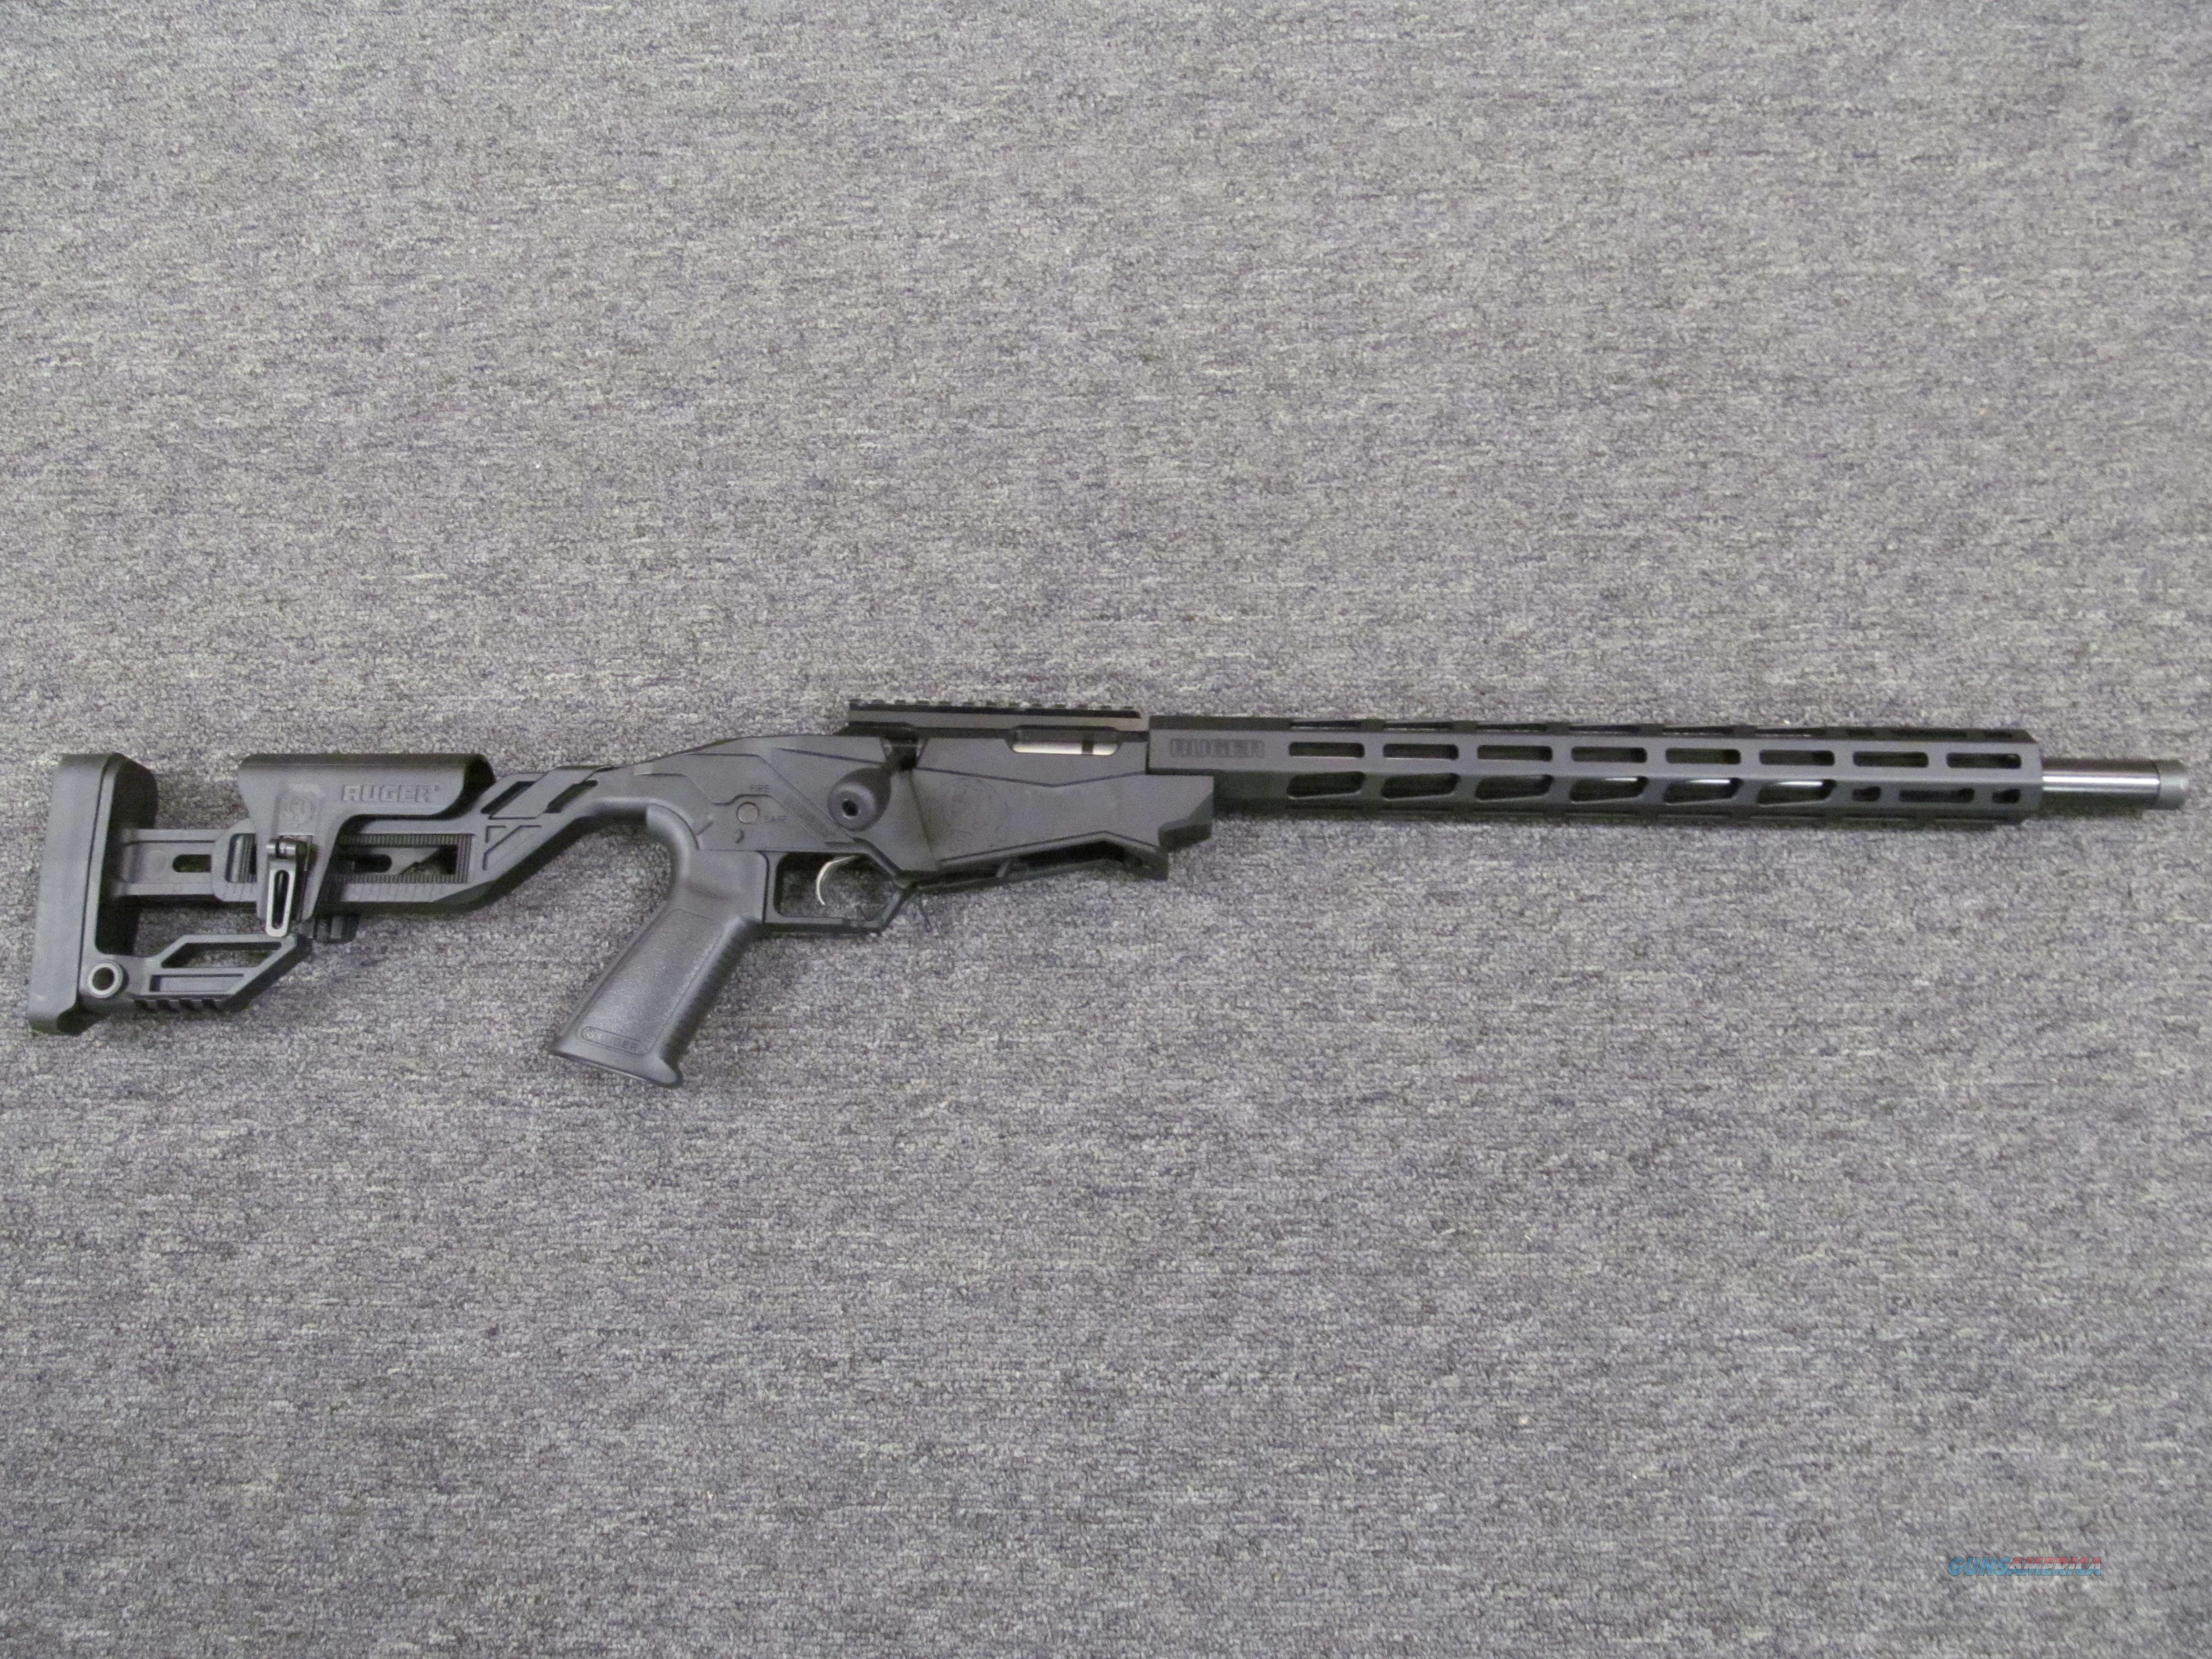 Ruger Precision Rimfire  Guns > Rifles > Ruger Rifles > Precision Rifle Series